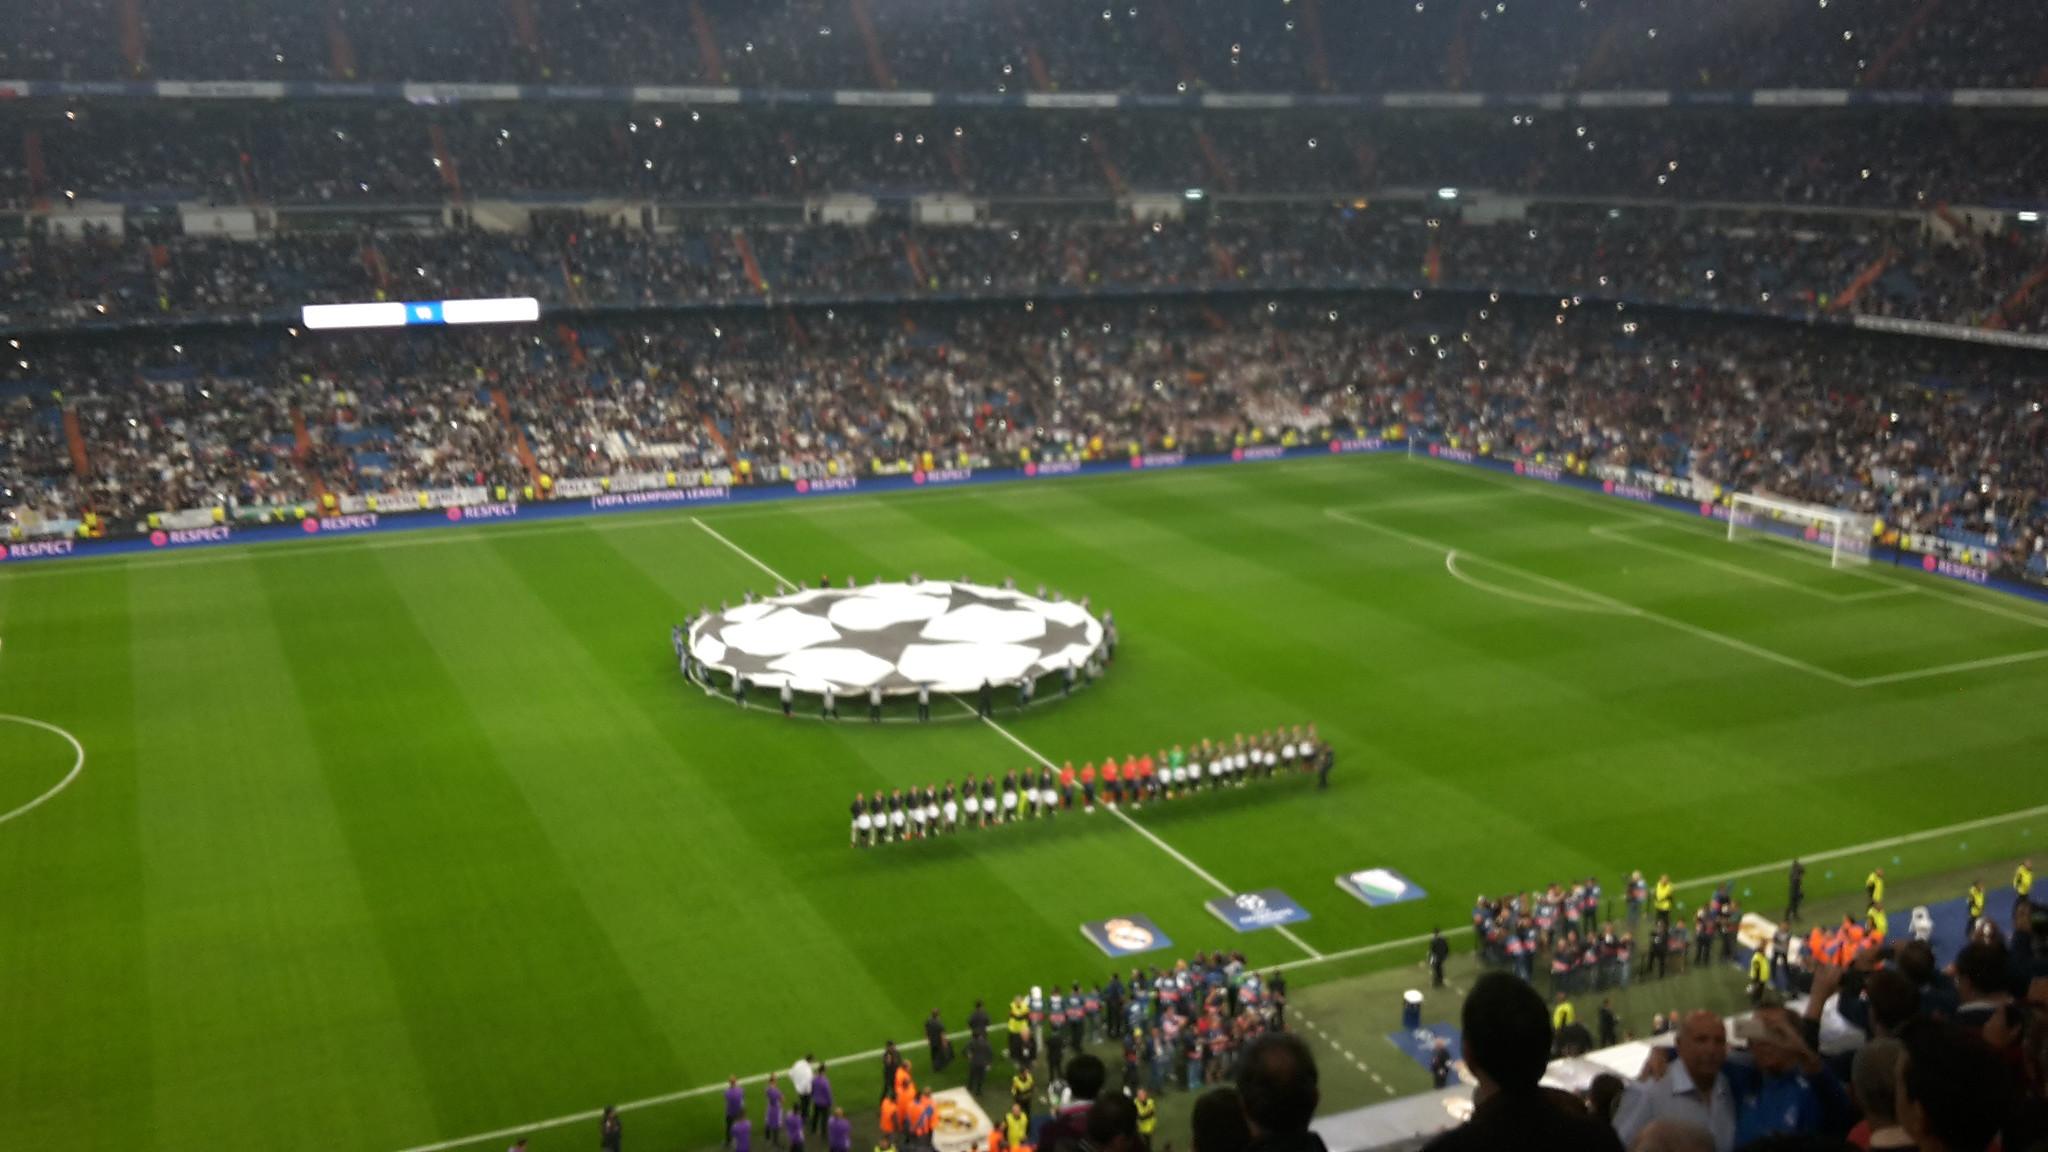 Real Madrid-Legia Warsaw